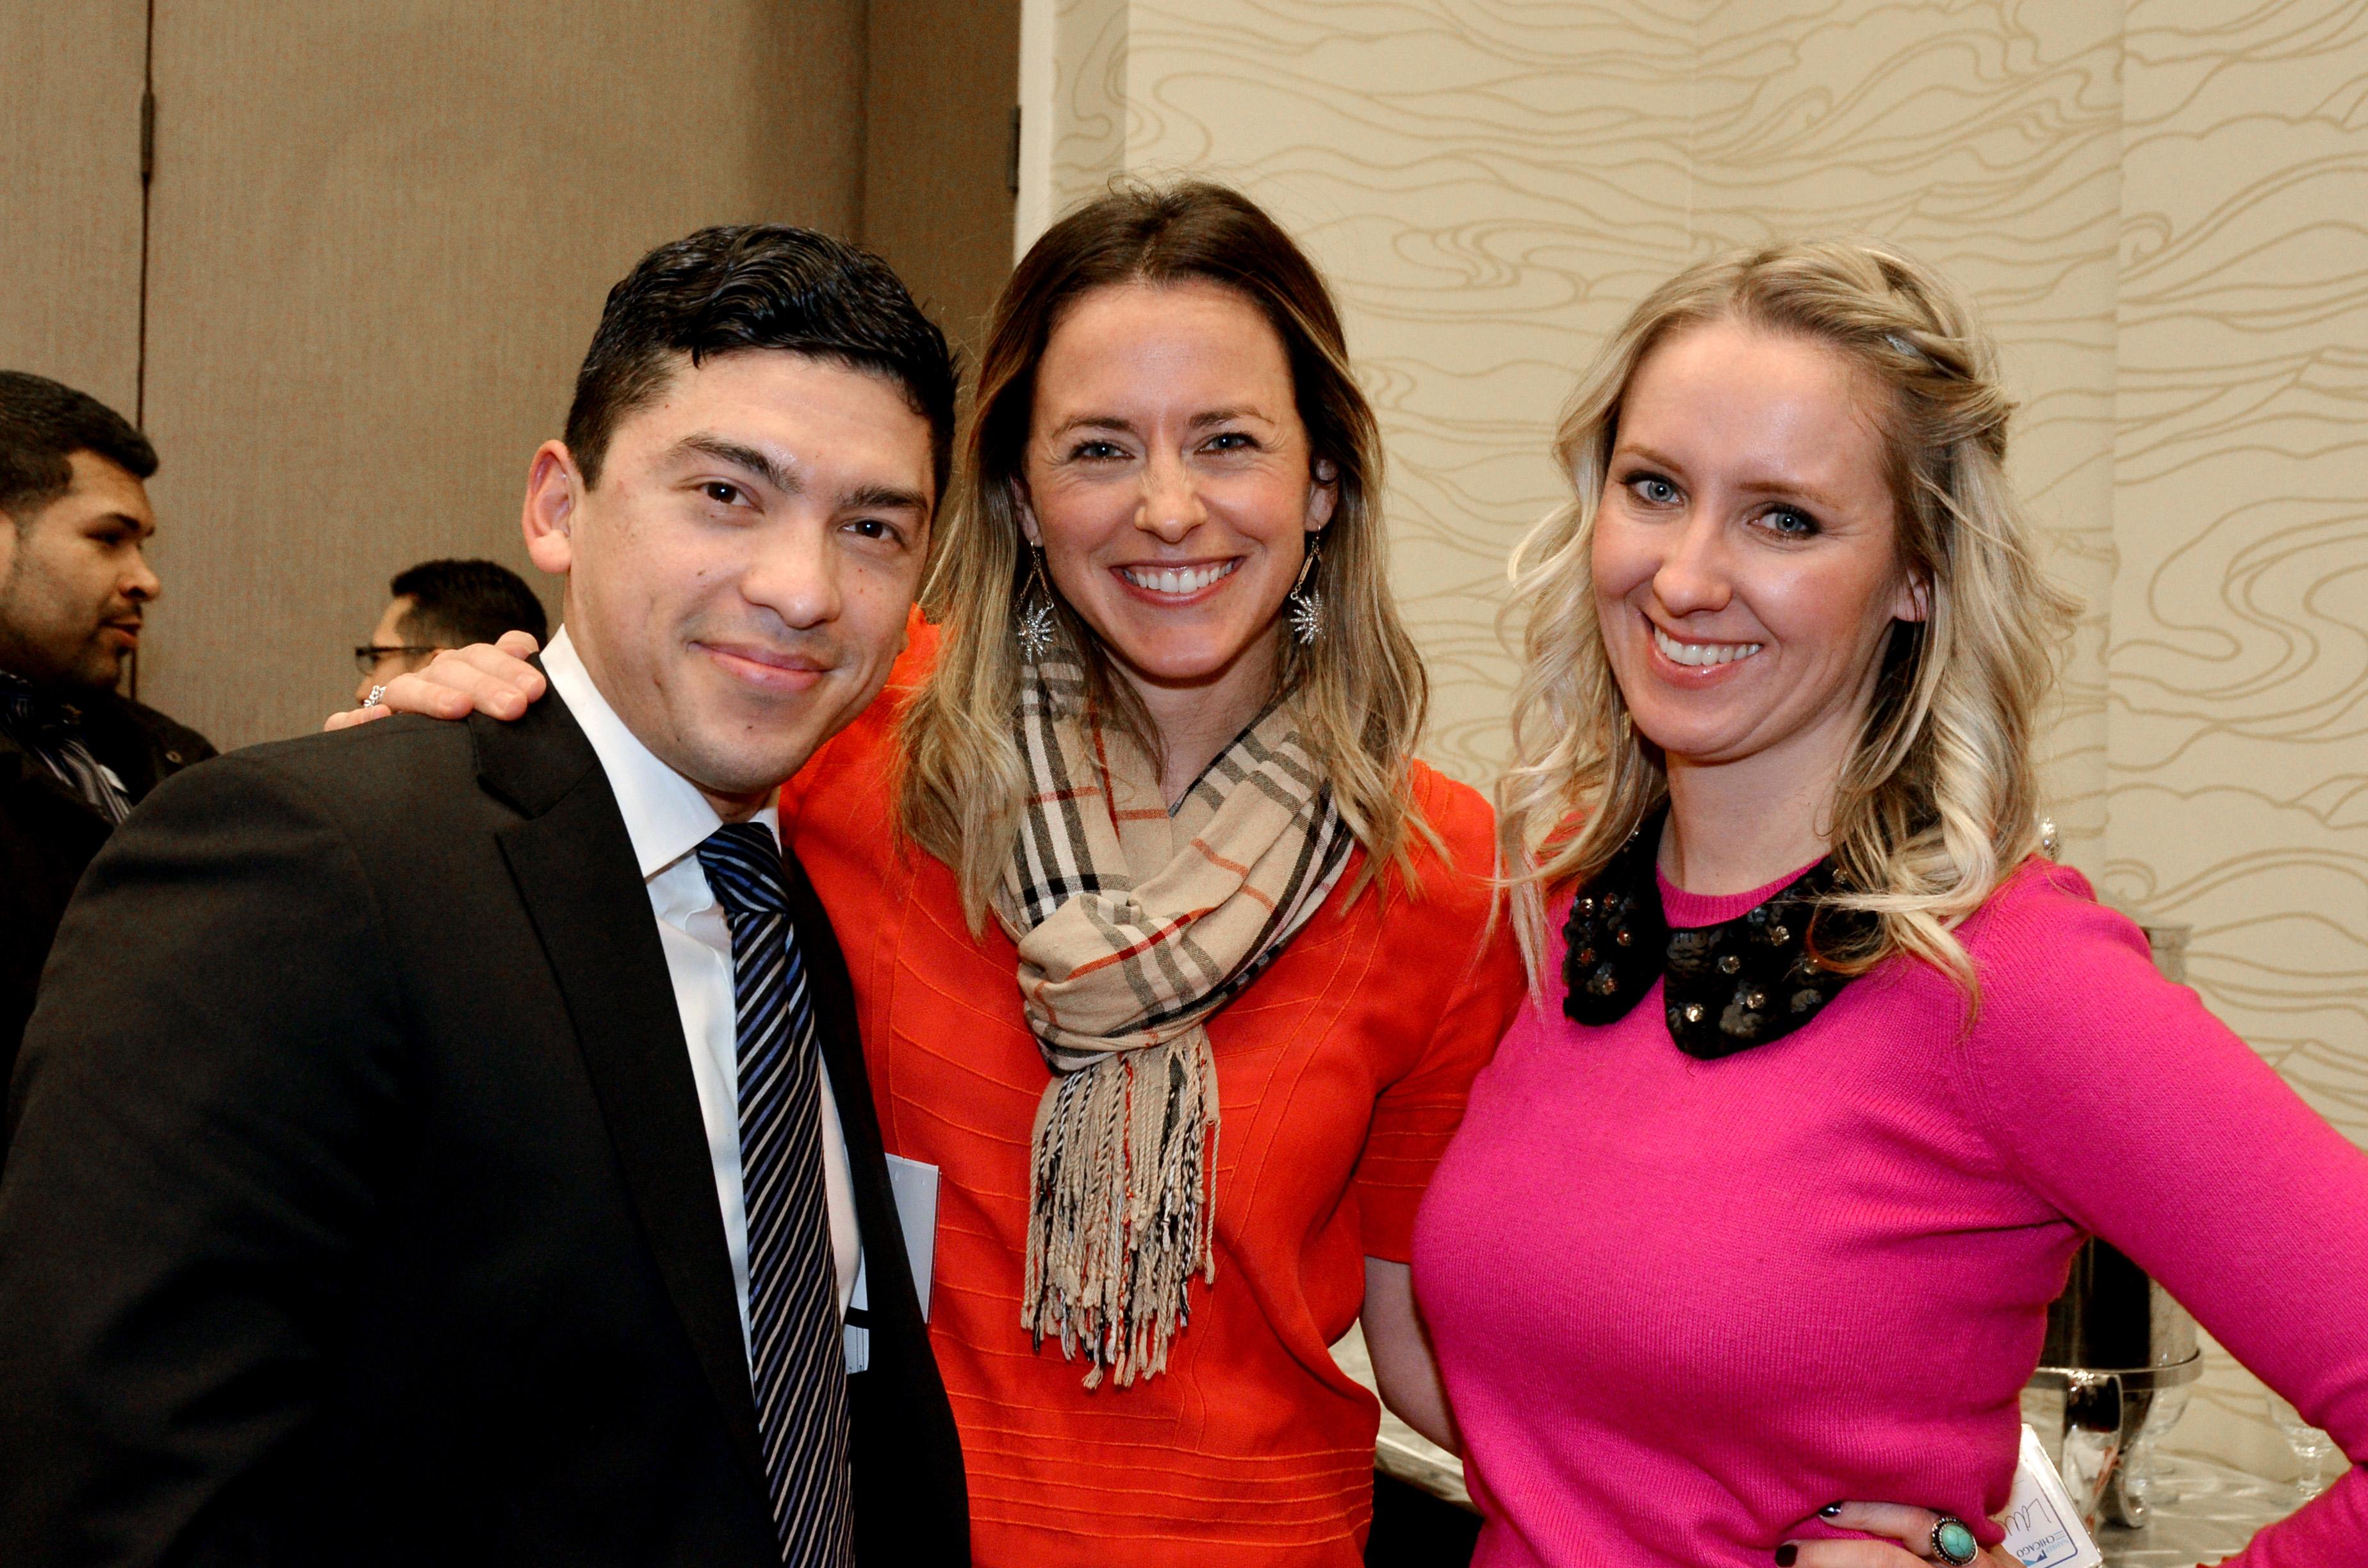 030-Jorge-Vega-Lauren-Mitrick-Crystal-Washington-JPG.jpg